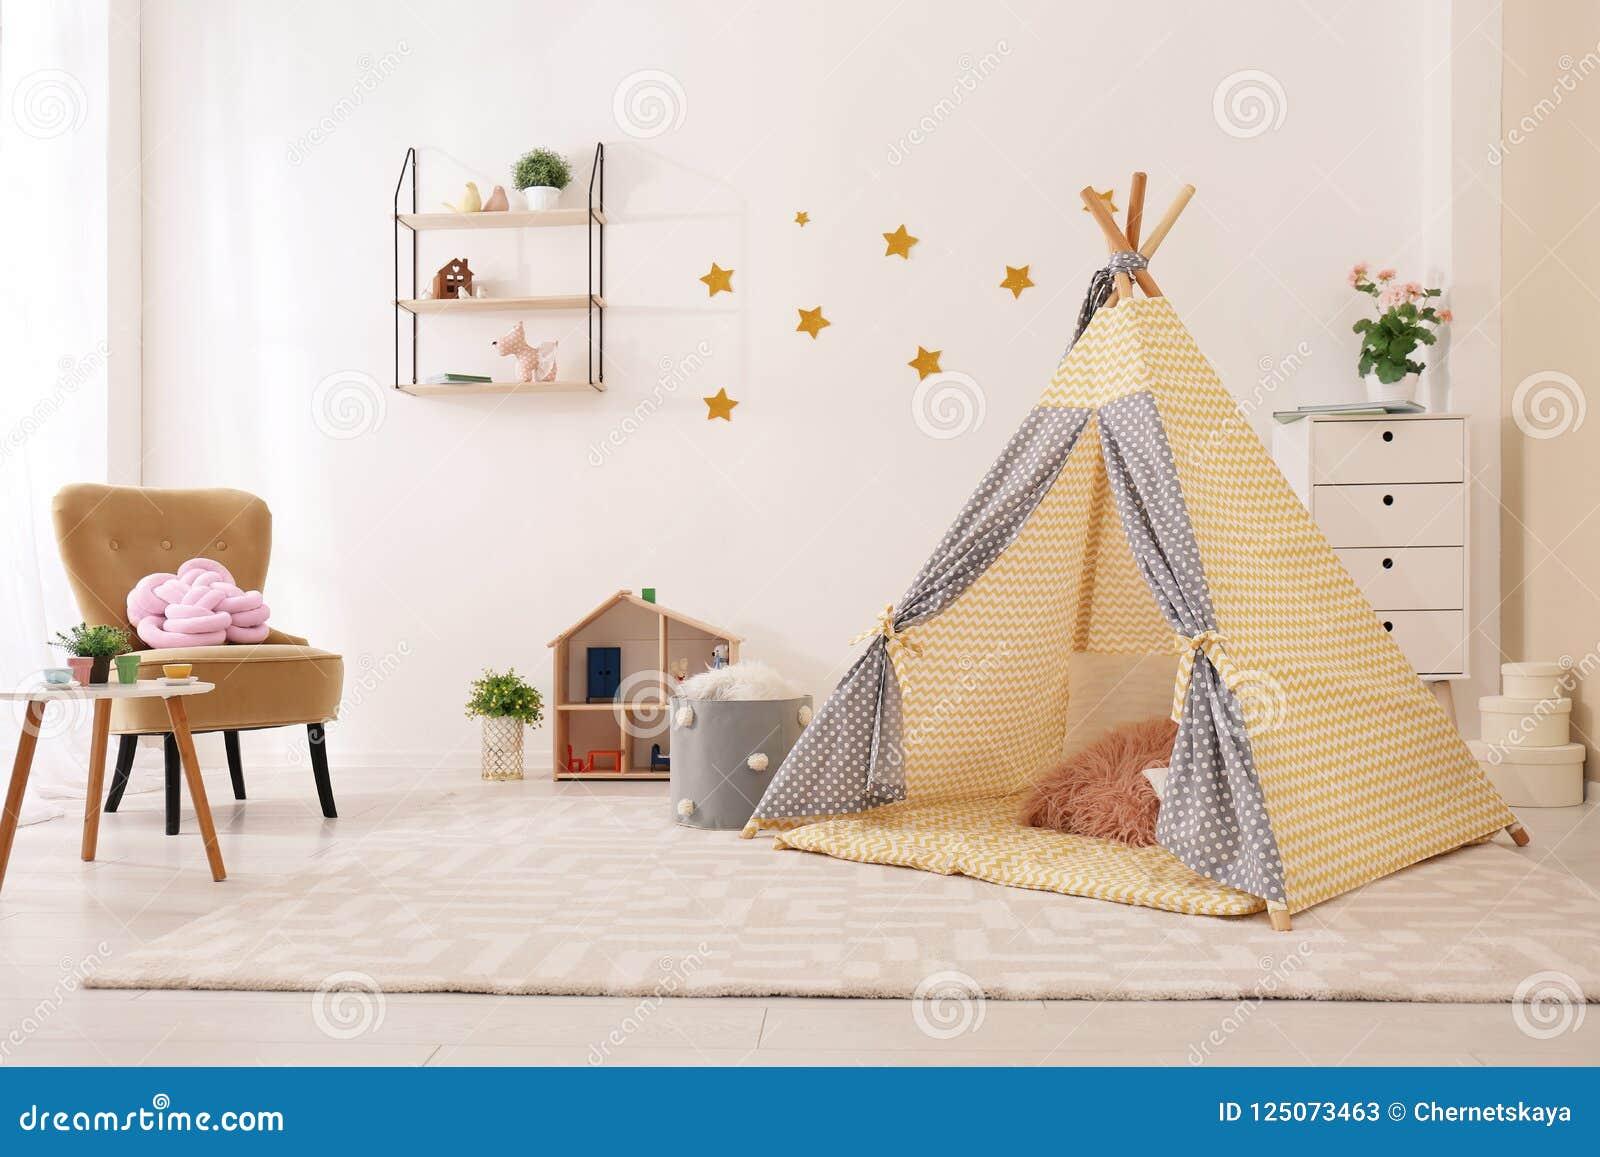 Cozy kids room interior with play tent & Cozy Kids Room Interior With Play Tent Stock Image - Image of cozy ...